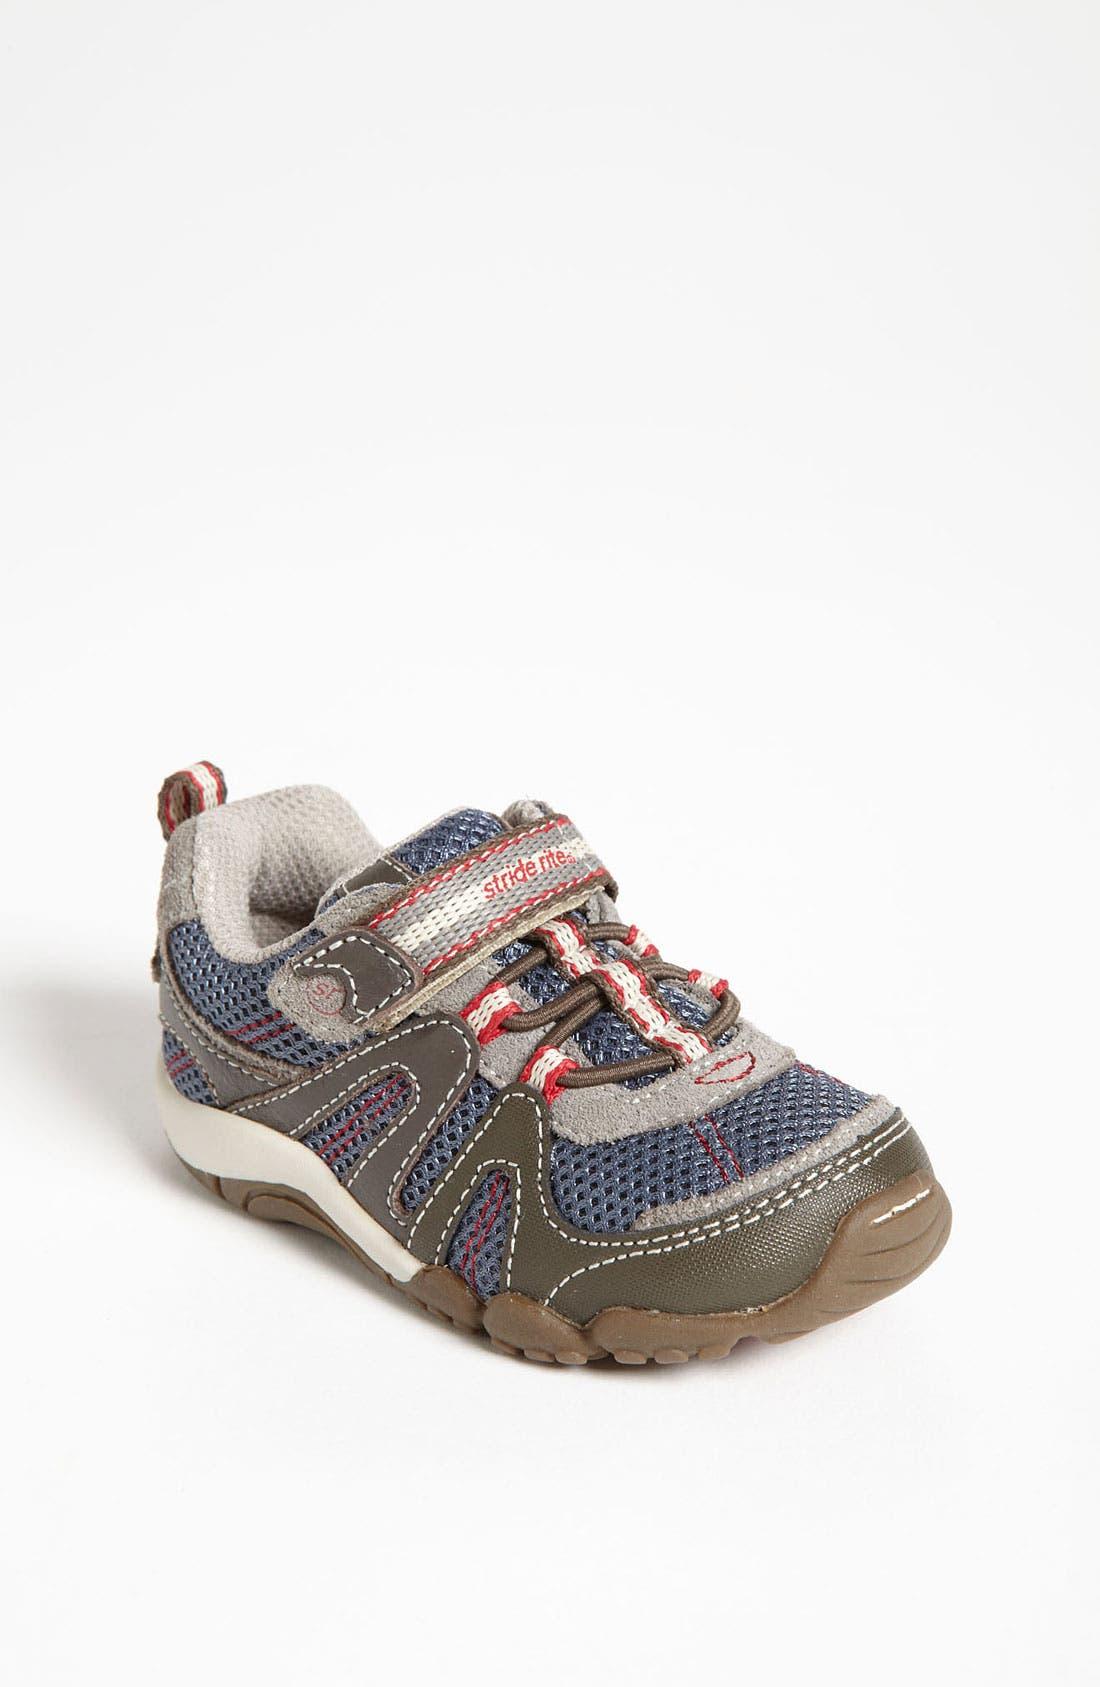 Alternate Image 1 Selected - Stride Rite 'Palmer' Sneaker (Baby, Walker & Toddler)